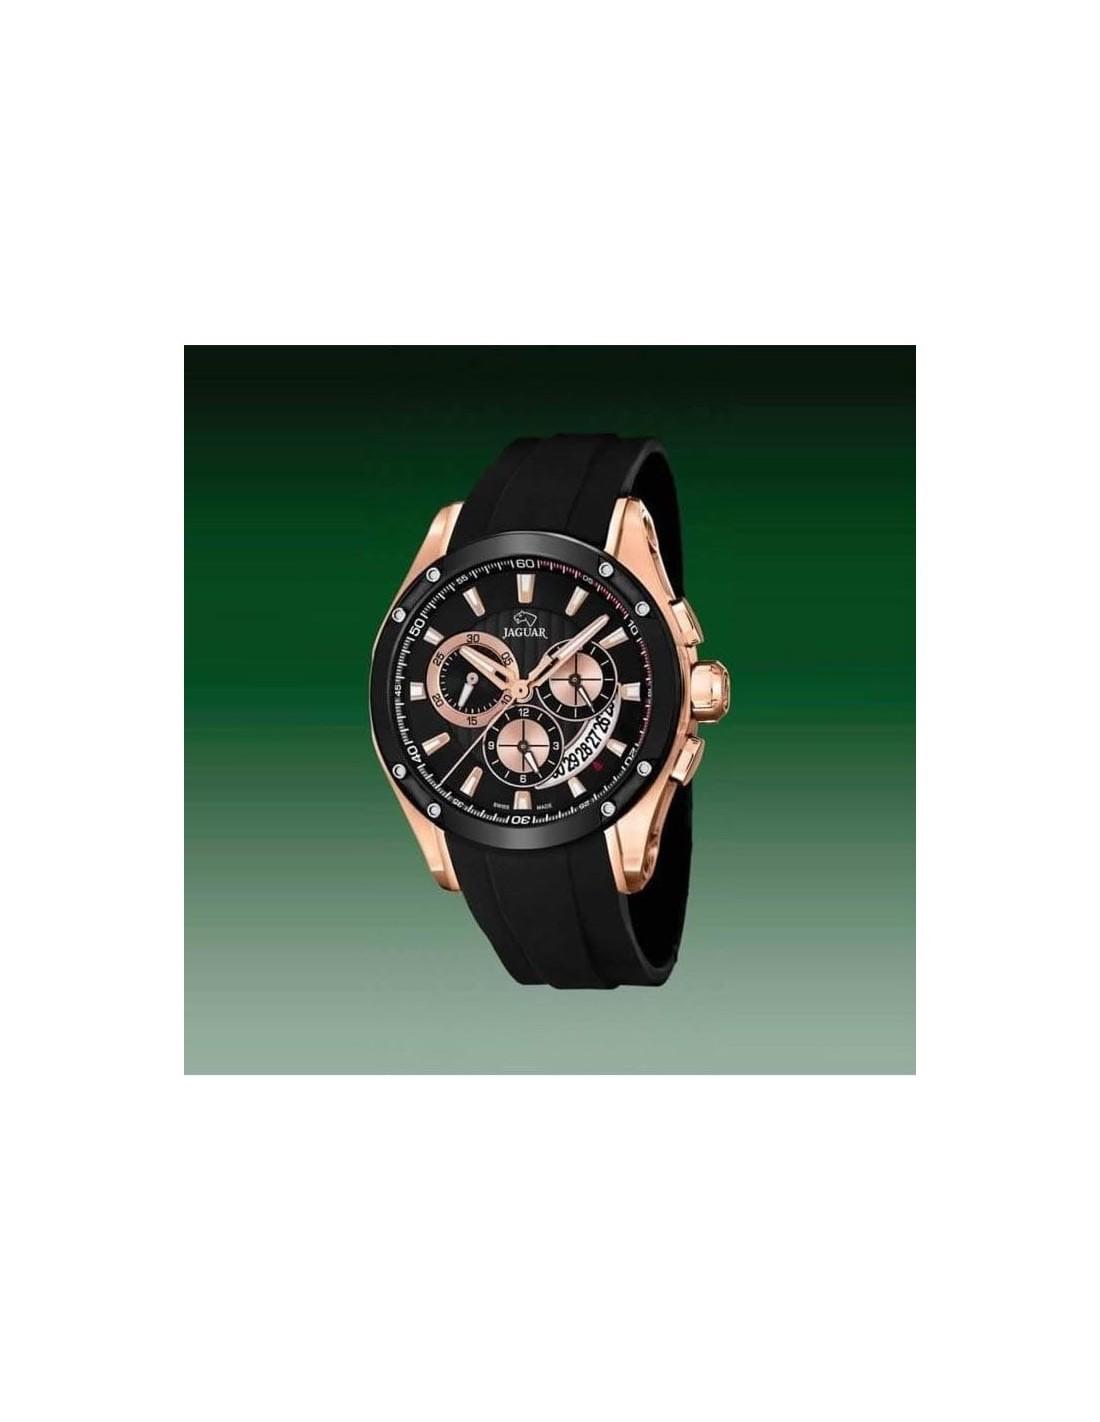 Edifice Casio 556d Clock Reloj 1avuef Distribuciones Hellin Efr tsdrxBohQC